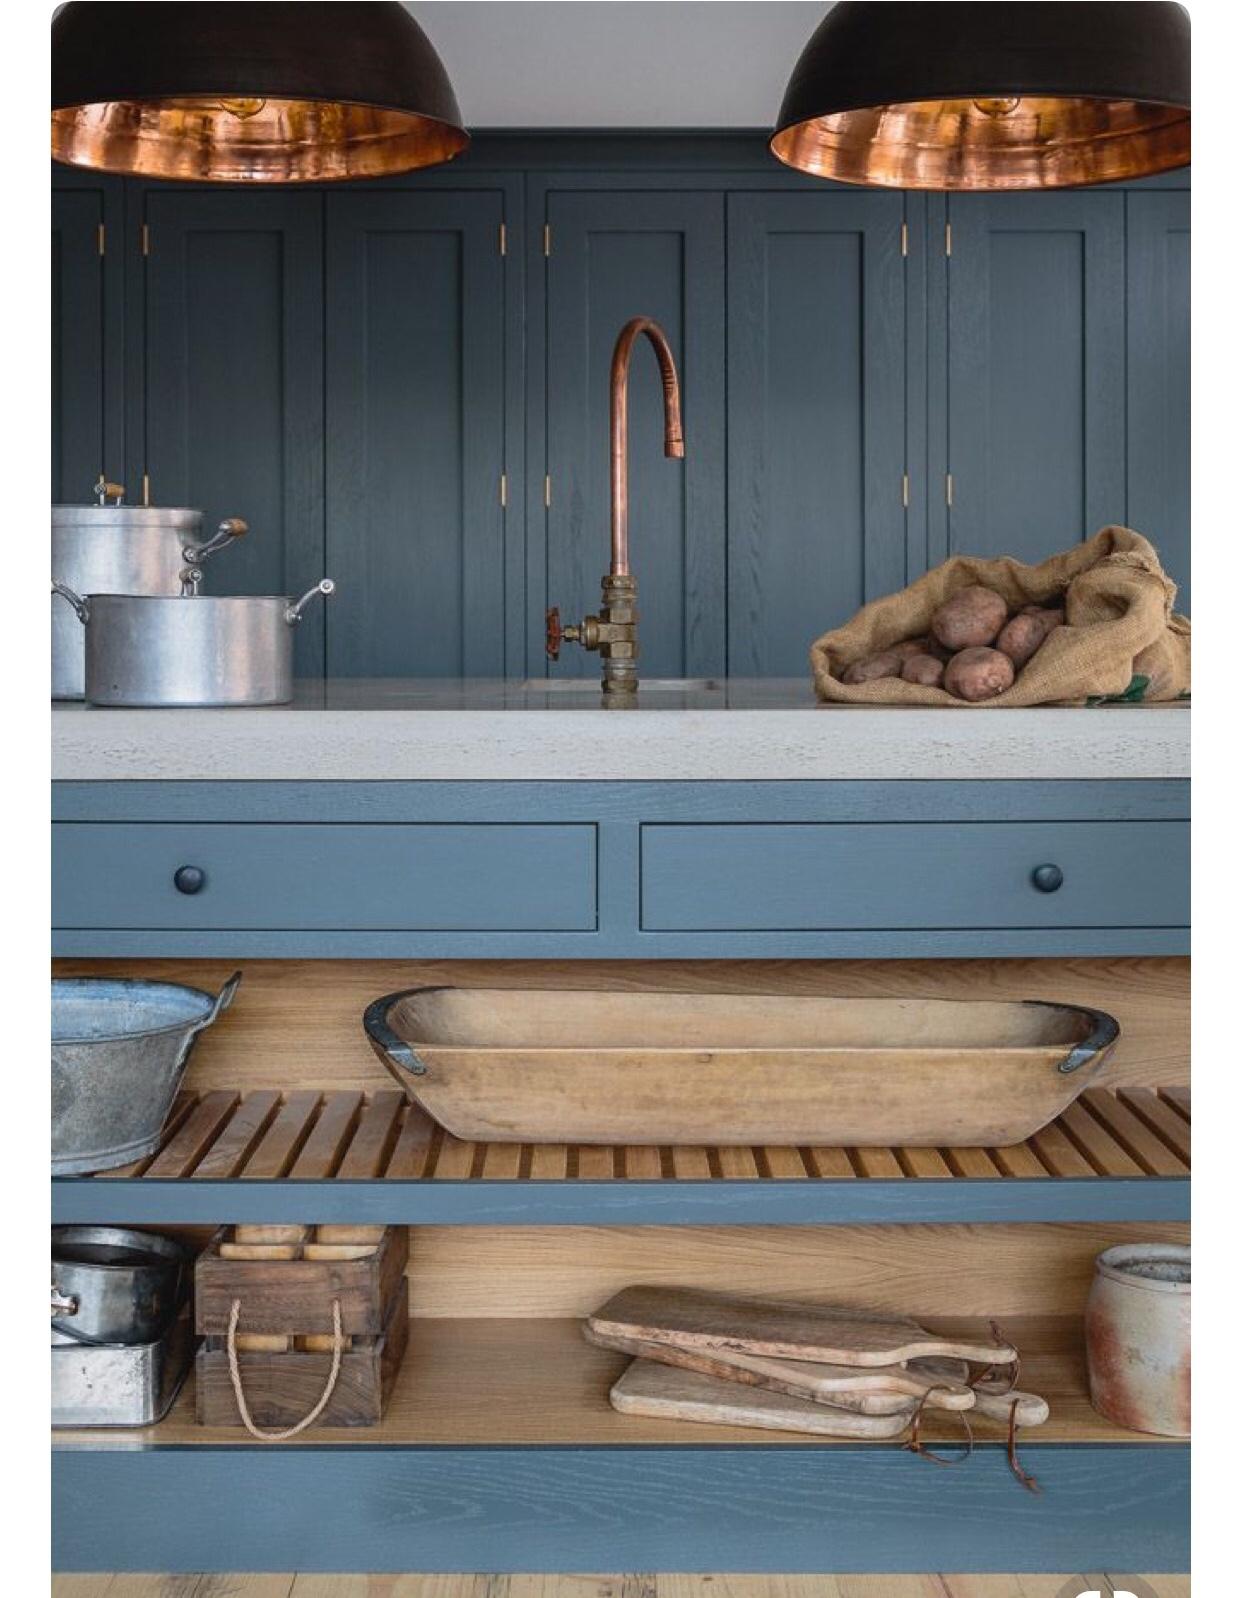 Source: Sustainable Kitchens via Pinterest